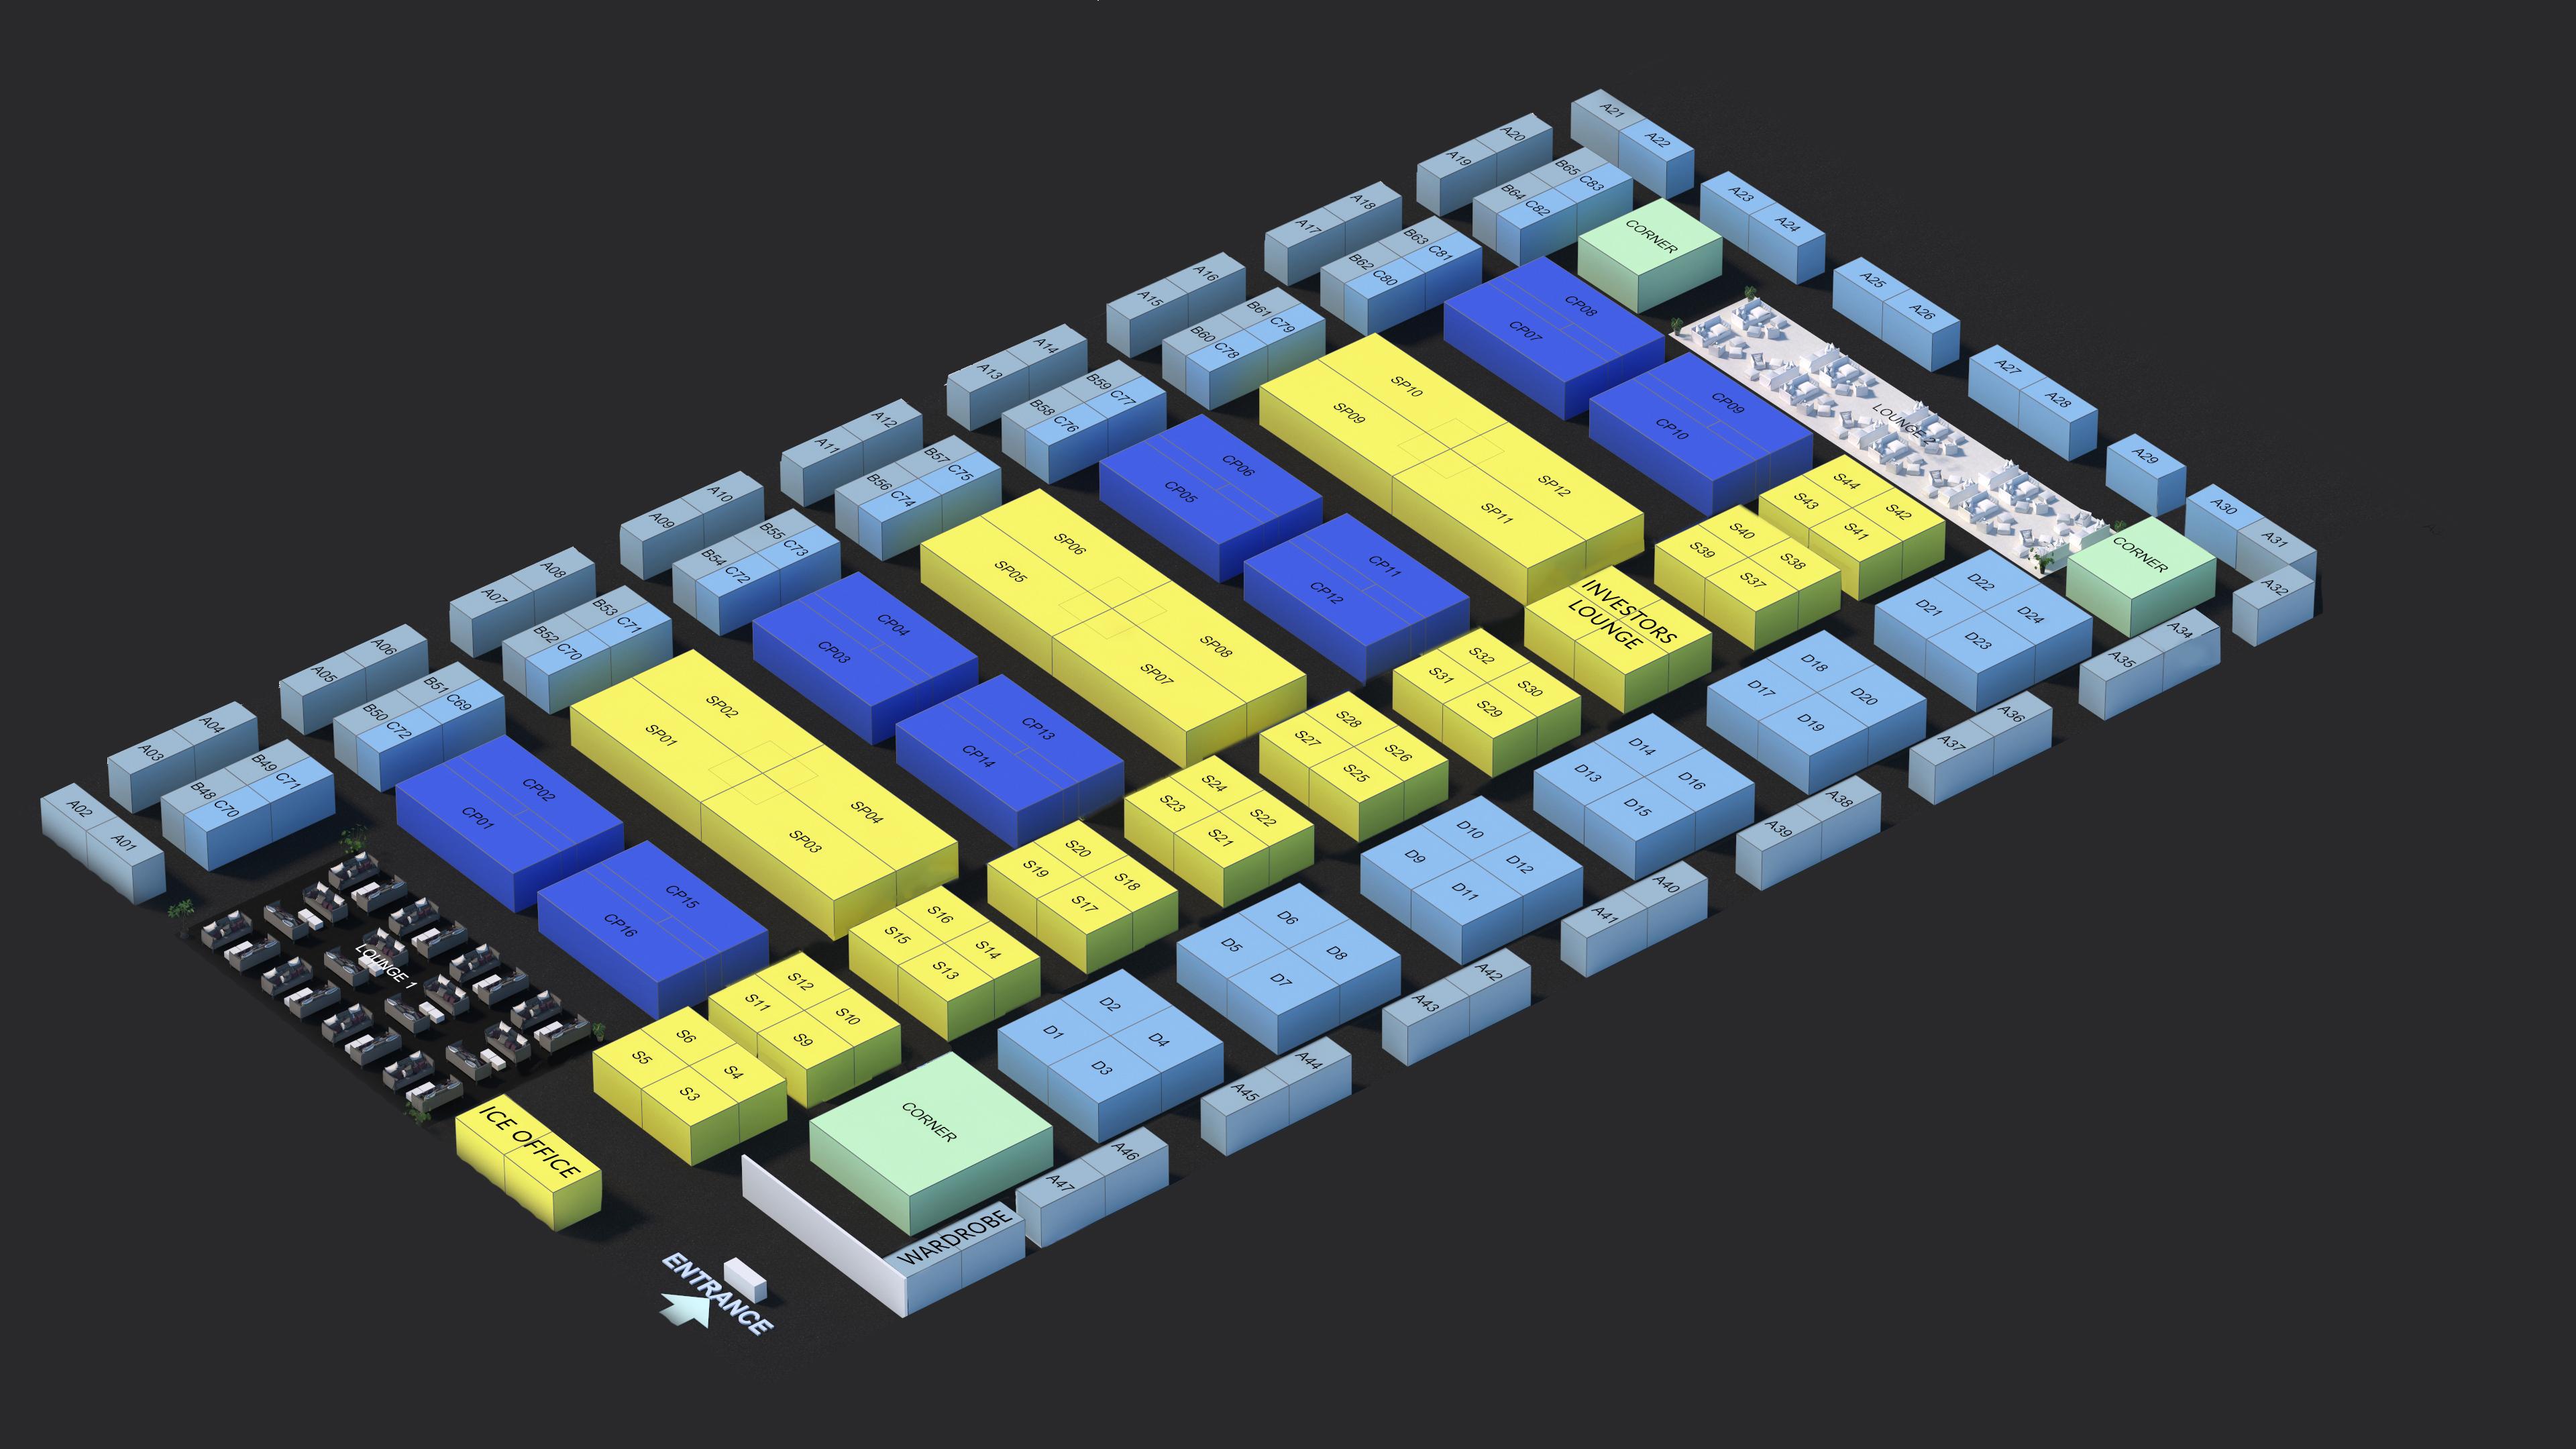 ICE'19 layout